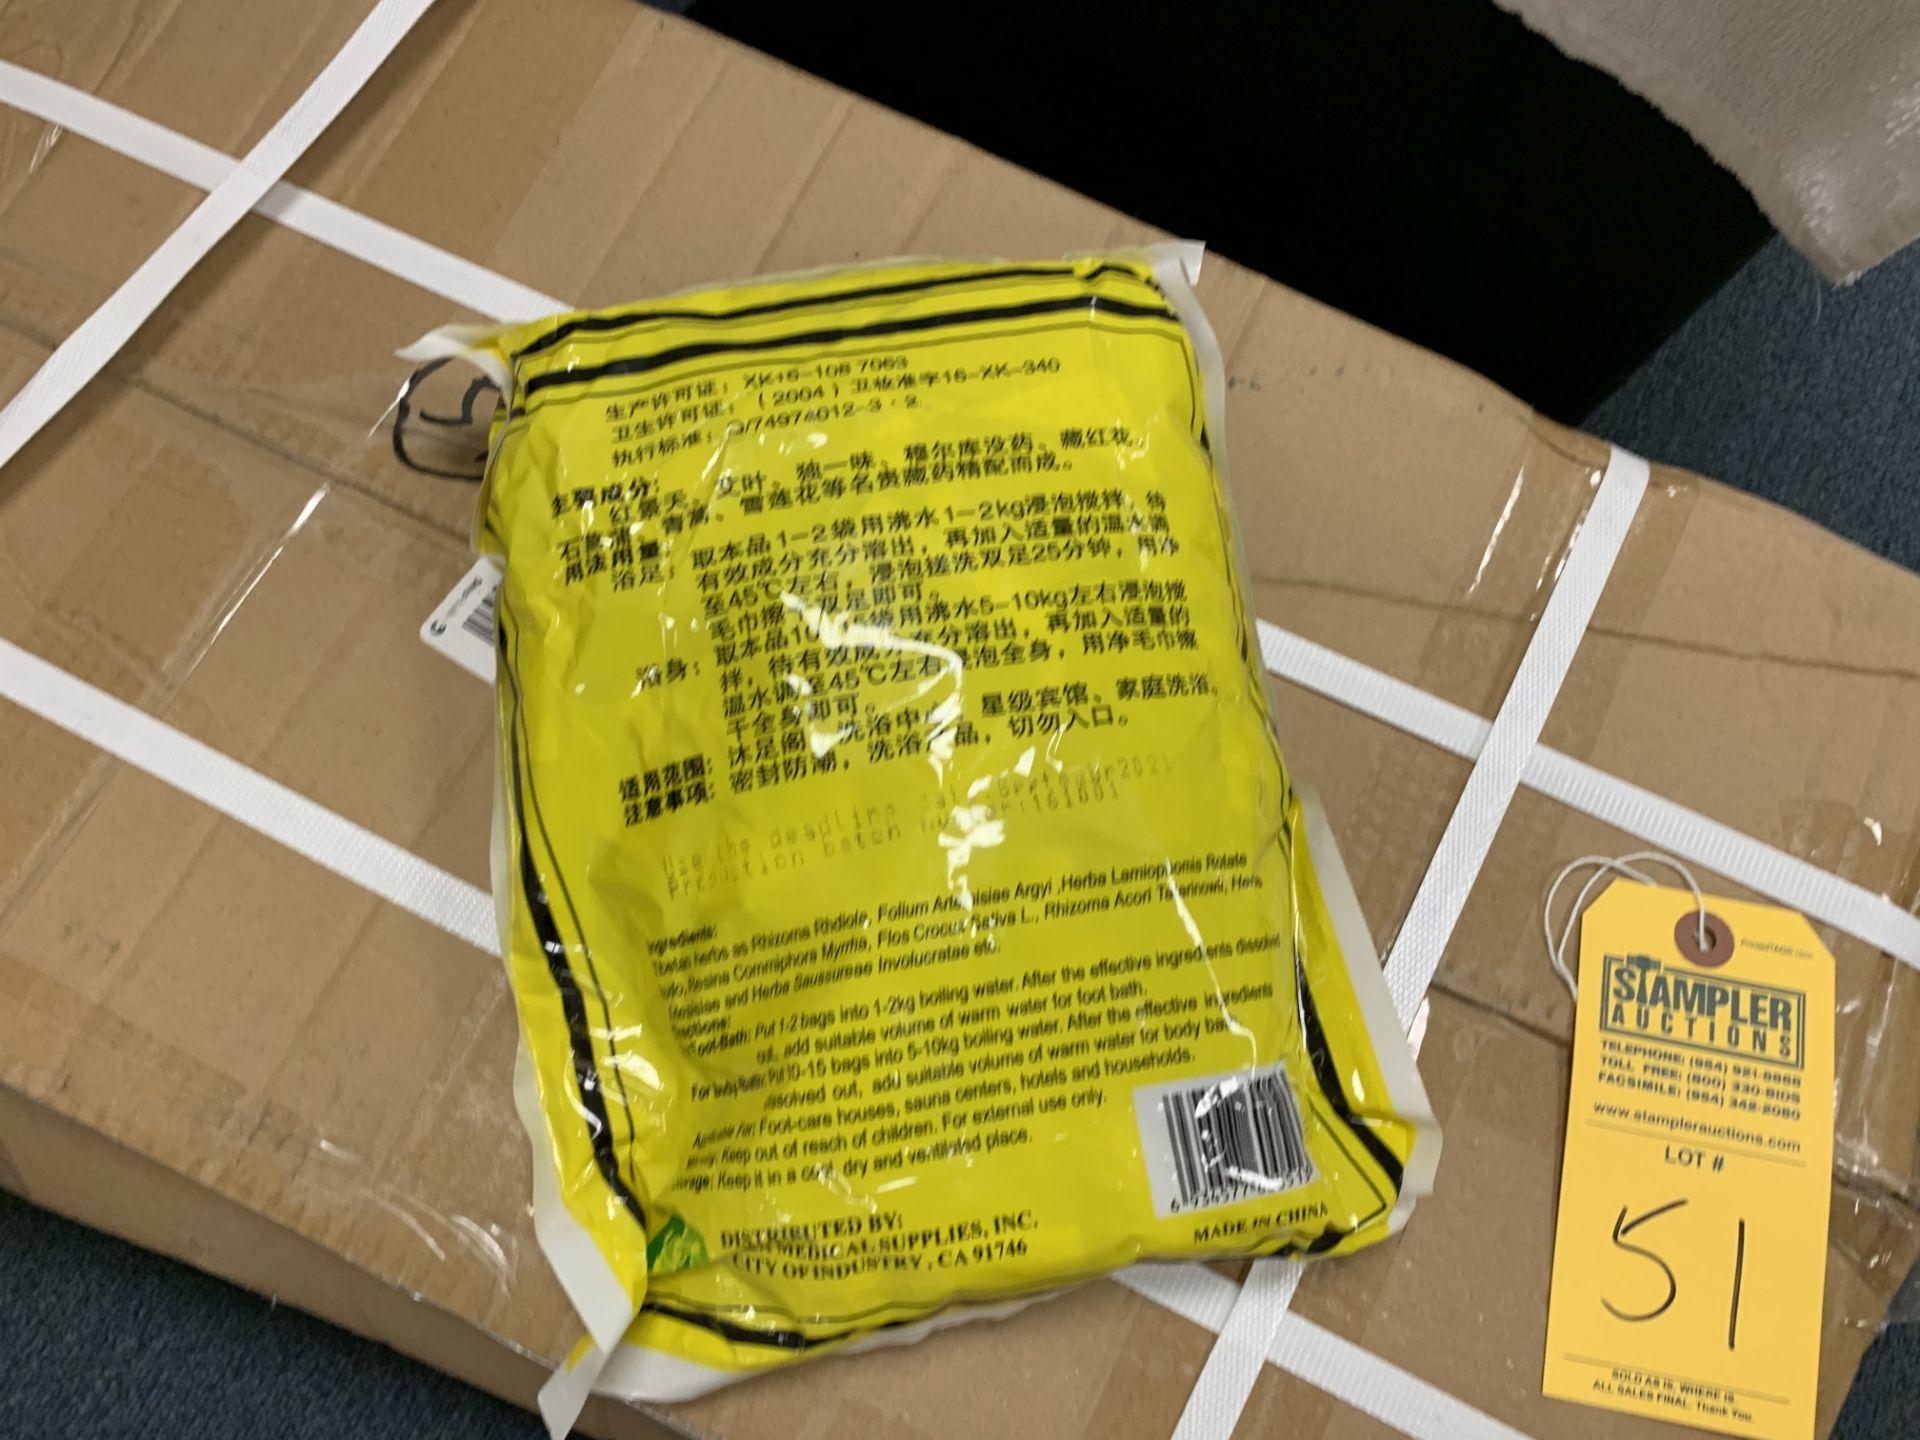 Lot 351 - LOT / BOX EVERSPRING BATH POWDER / TEA BAGS